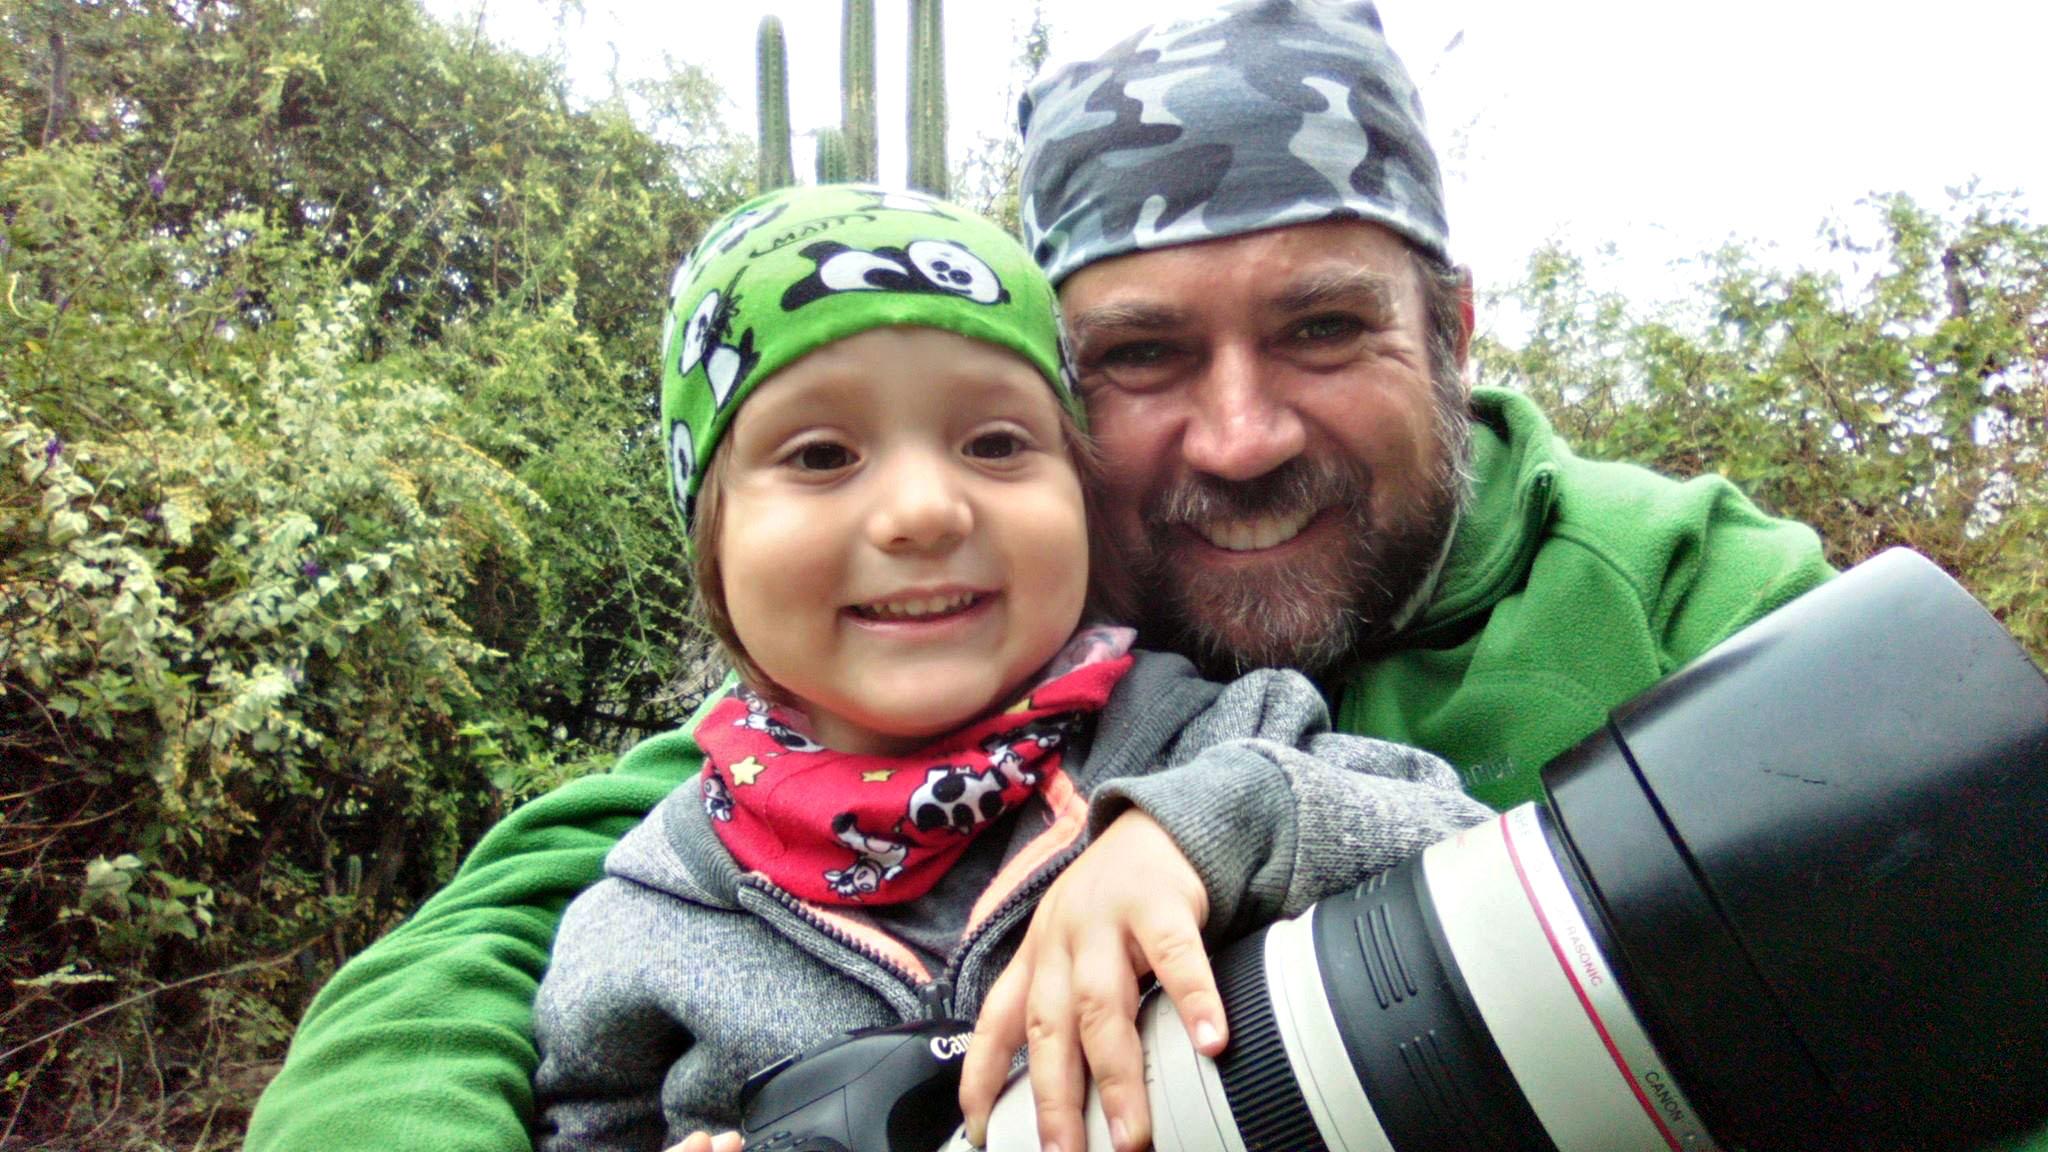 Un Viaje de Aprendizaje: Solos la Naturaleza, mi Hijo y Yo